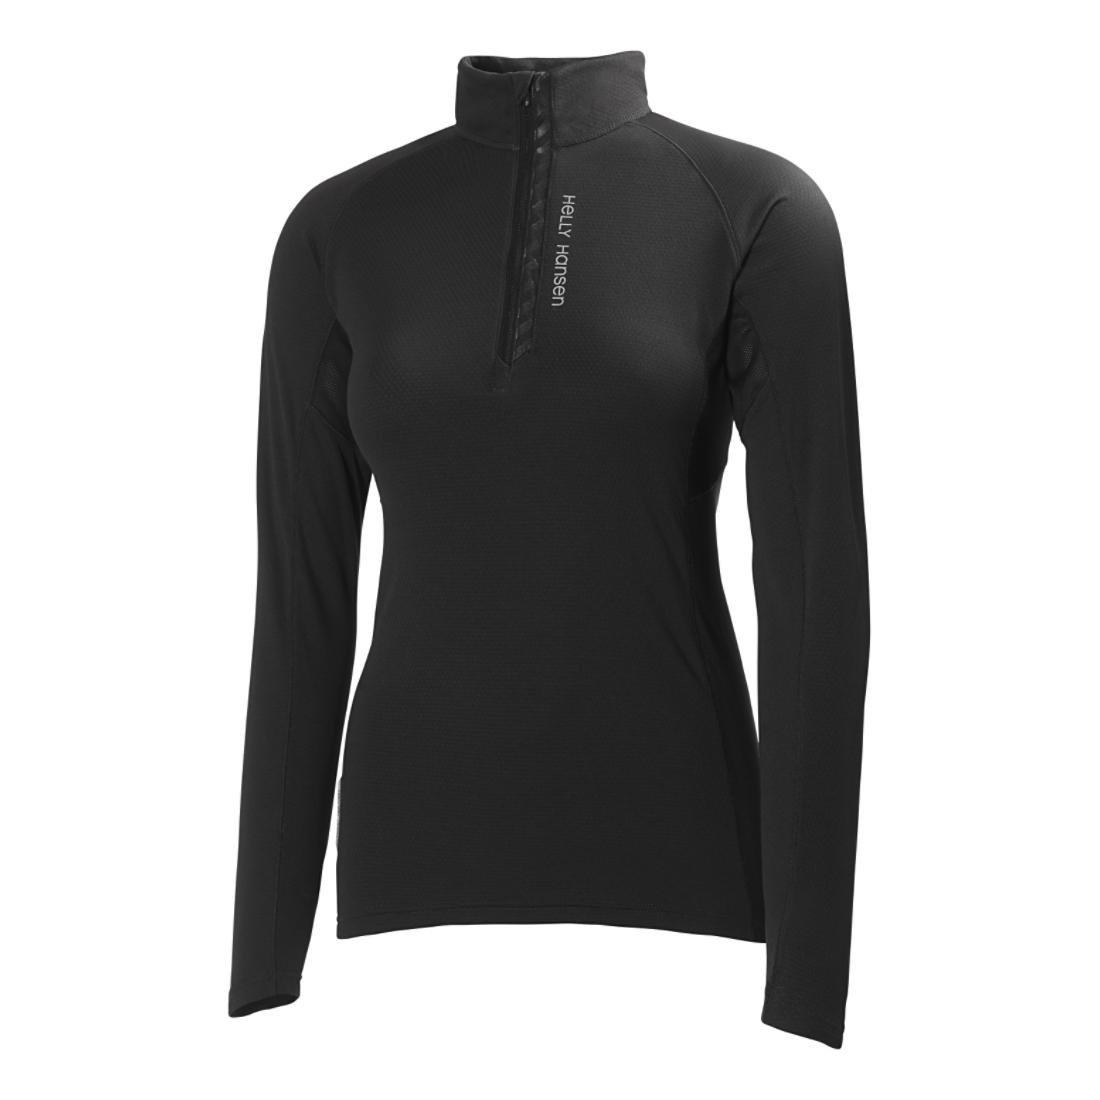 Helly Hansen Pace 1/2 Zip Lifa Flow Women's Long Sleeve Top